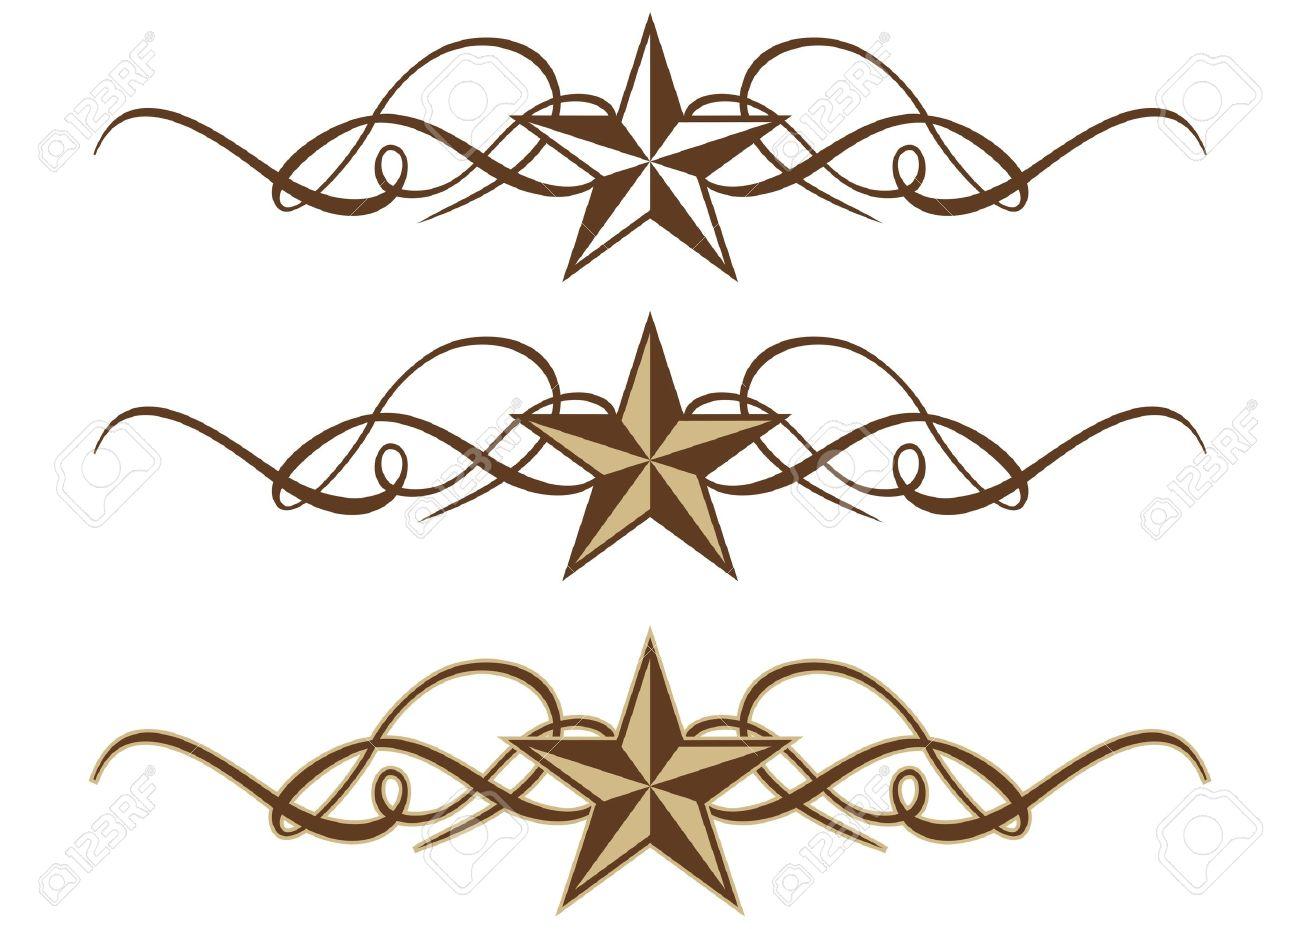 three western star scrolls in format royalty cliparts three western star scrolls in format stock vector 15820810